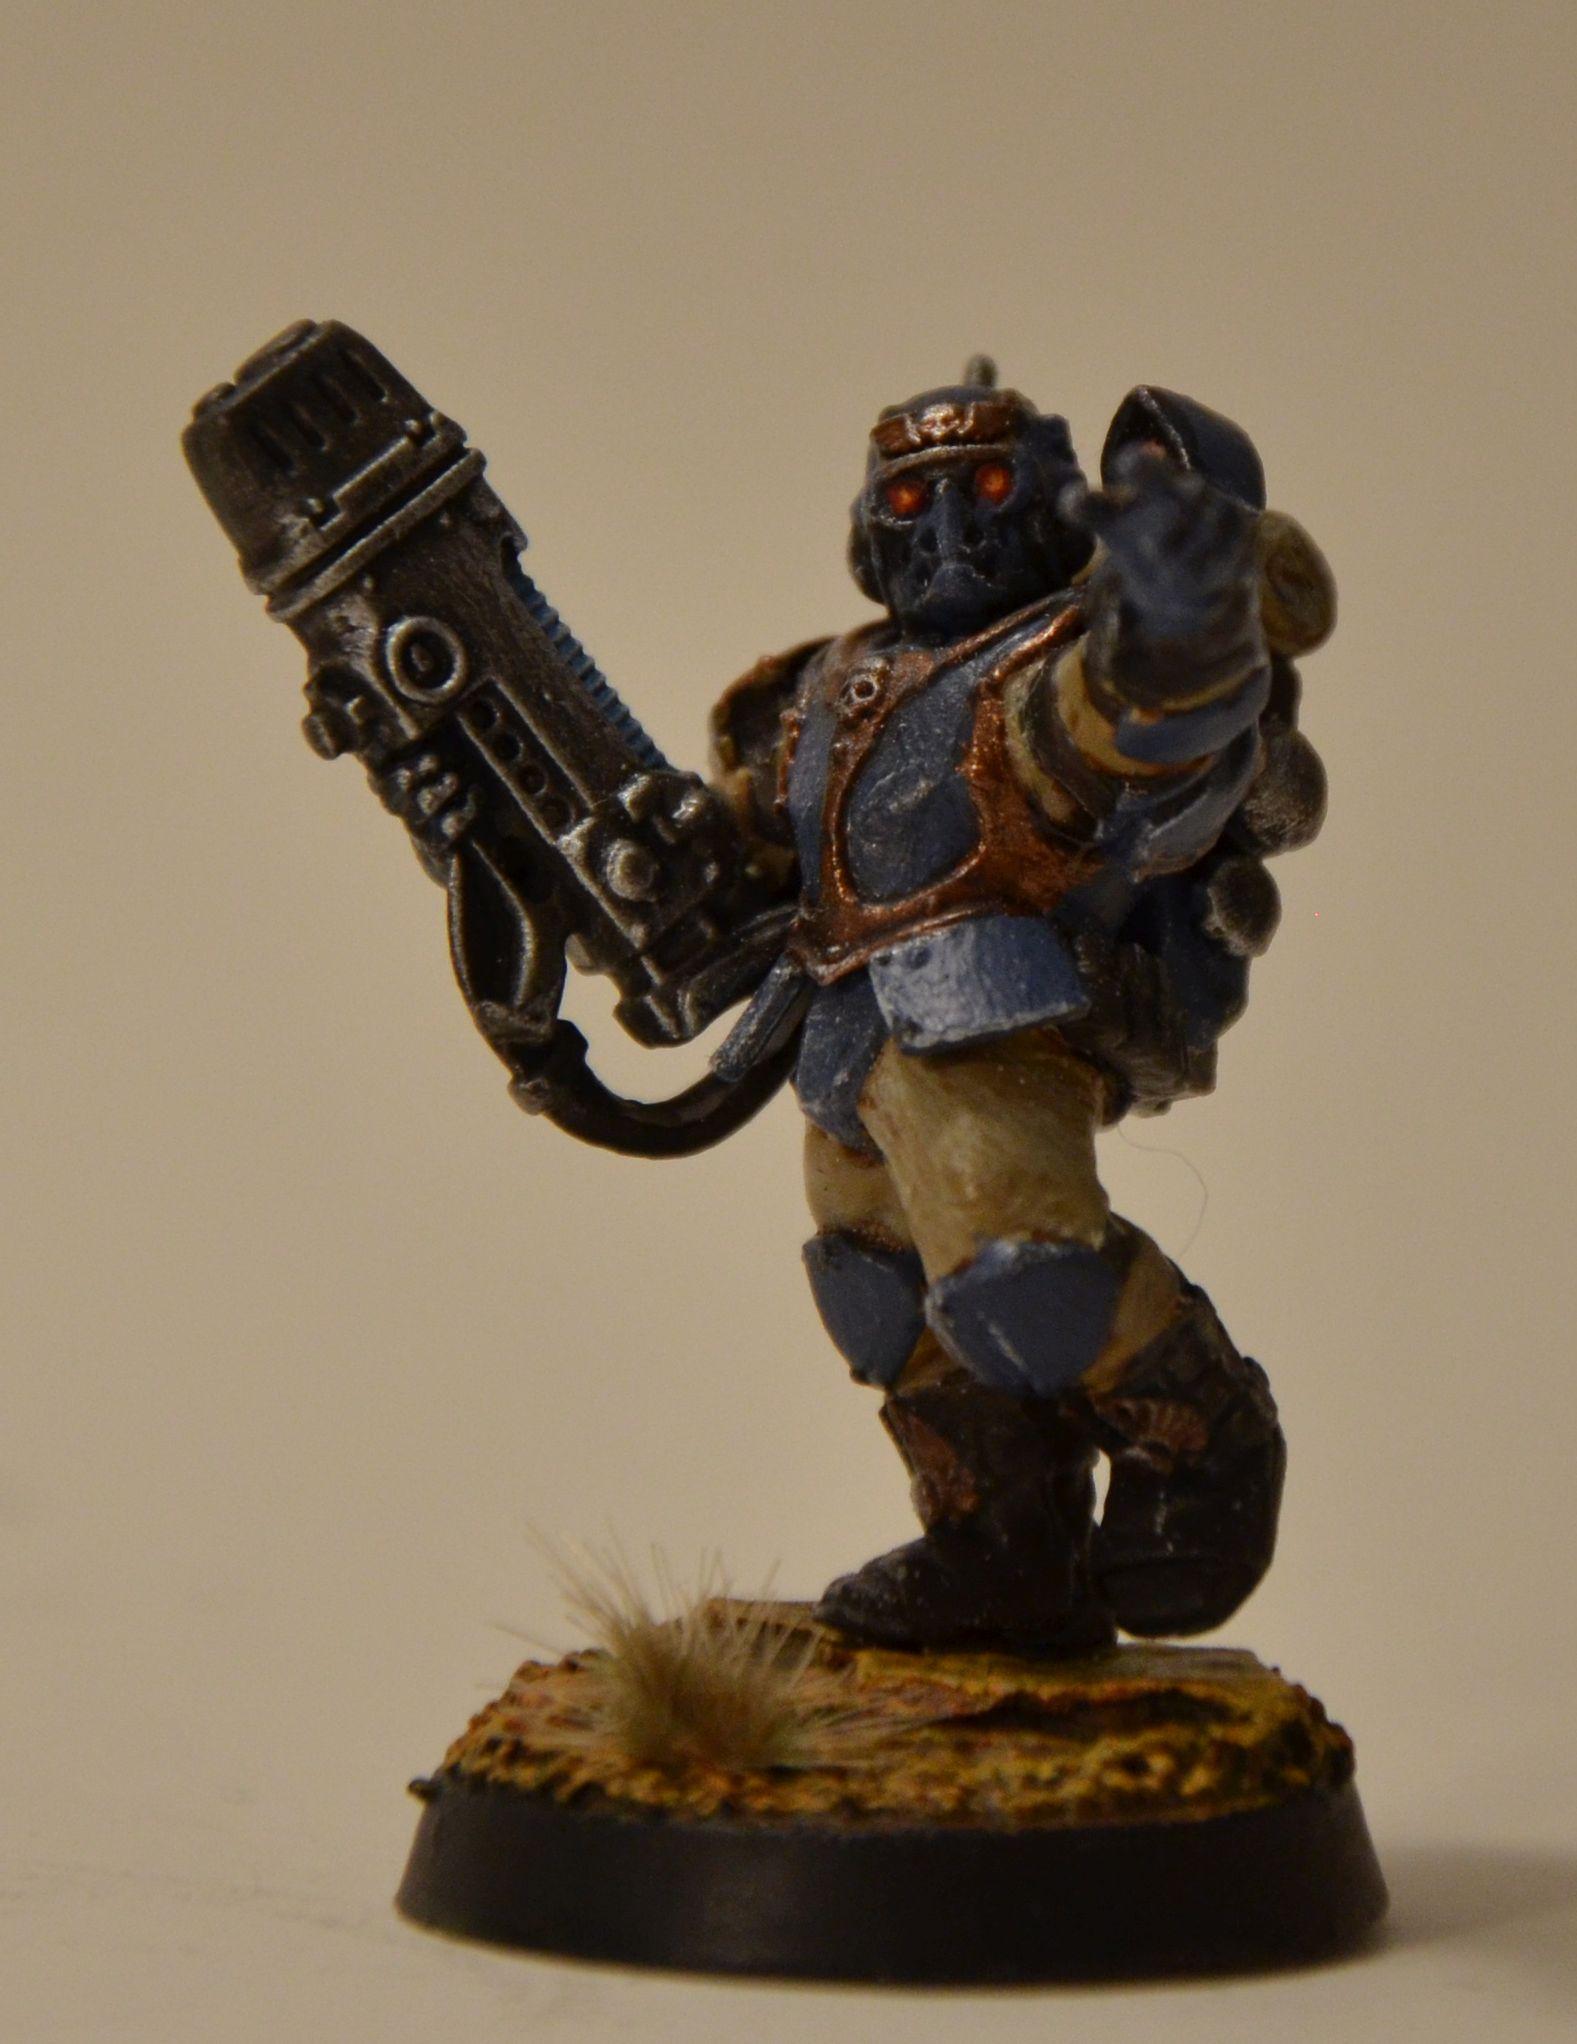 Militarum Tempestus, Scions, Warhammer 40,000